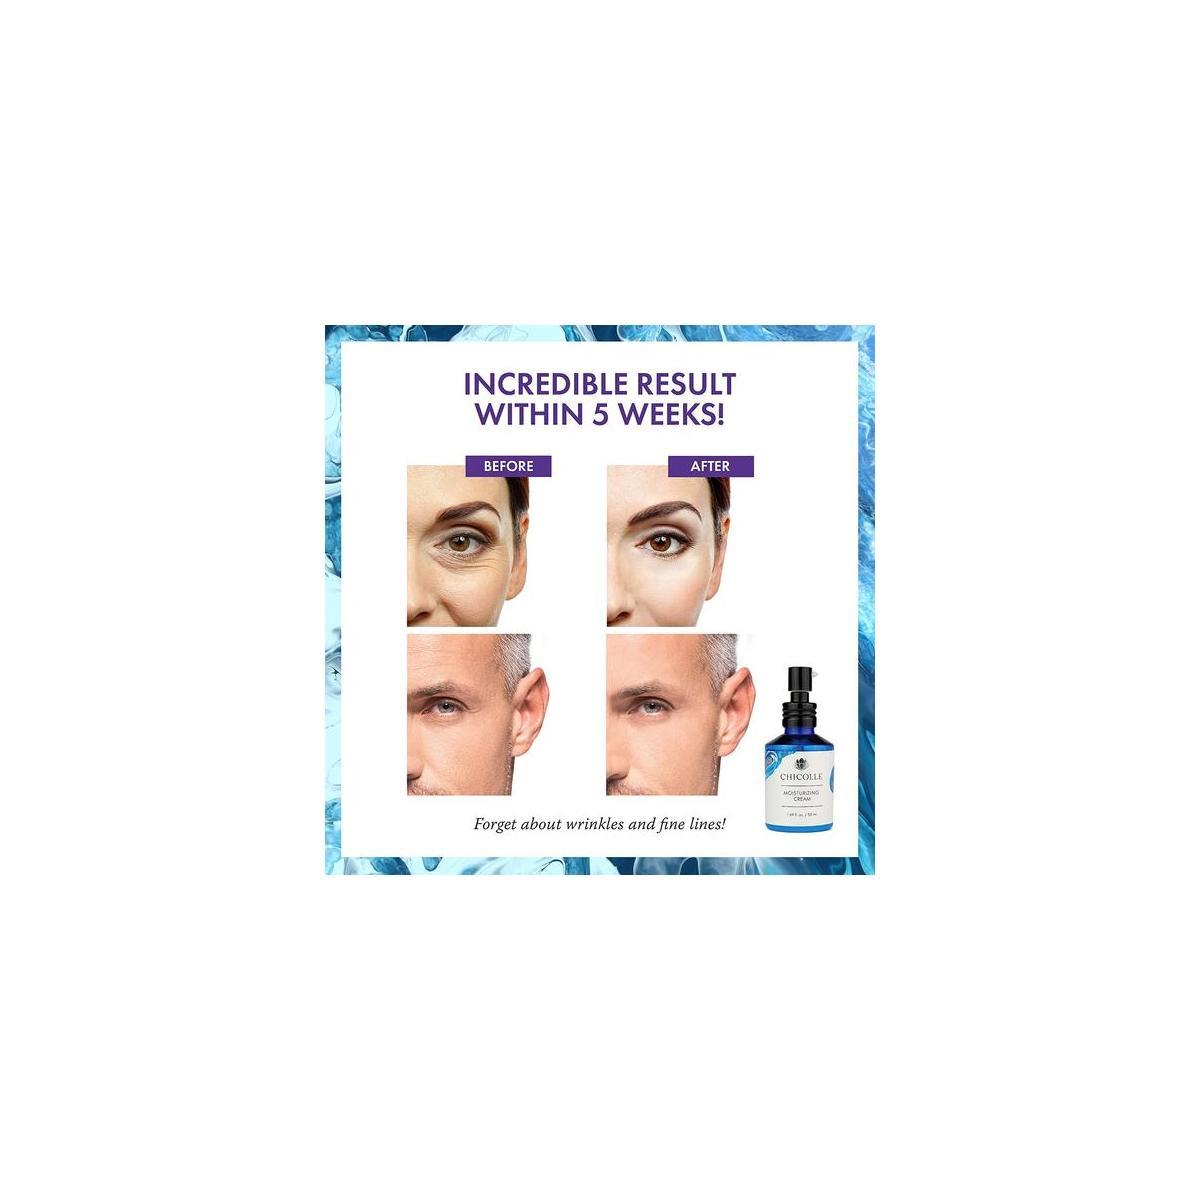 Natural Retinol Moisturizer Cream with Bakuchiol Retinol Alternative, Collagen, Macadamia Oil and Vitamin C - Best Anti Aging Face Cream to Reduce Wrinkles & Fine Lines - Results in 5 weeks